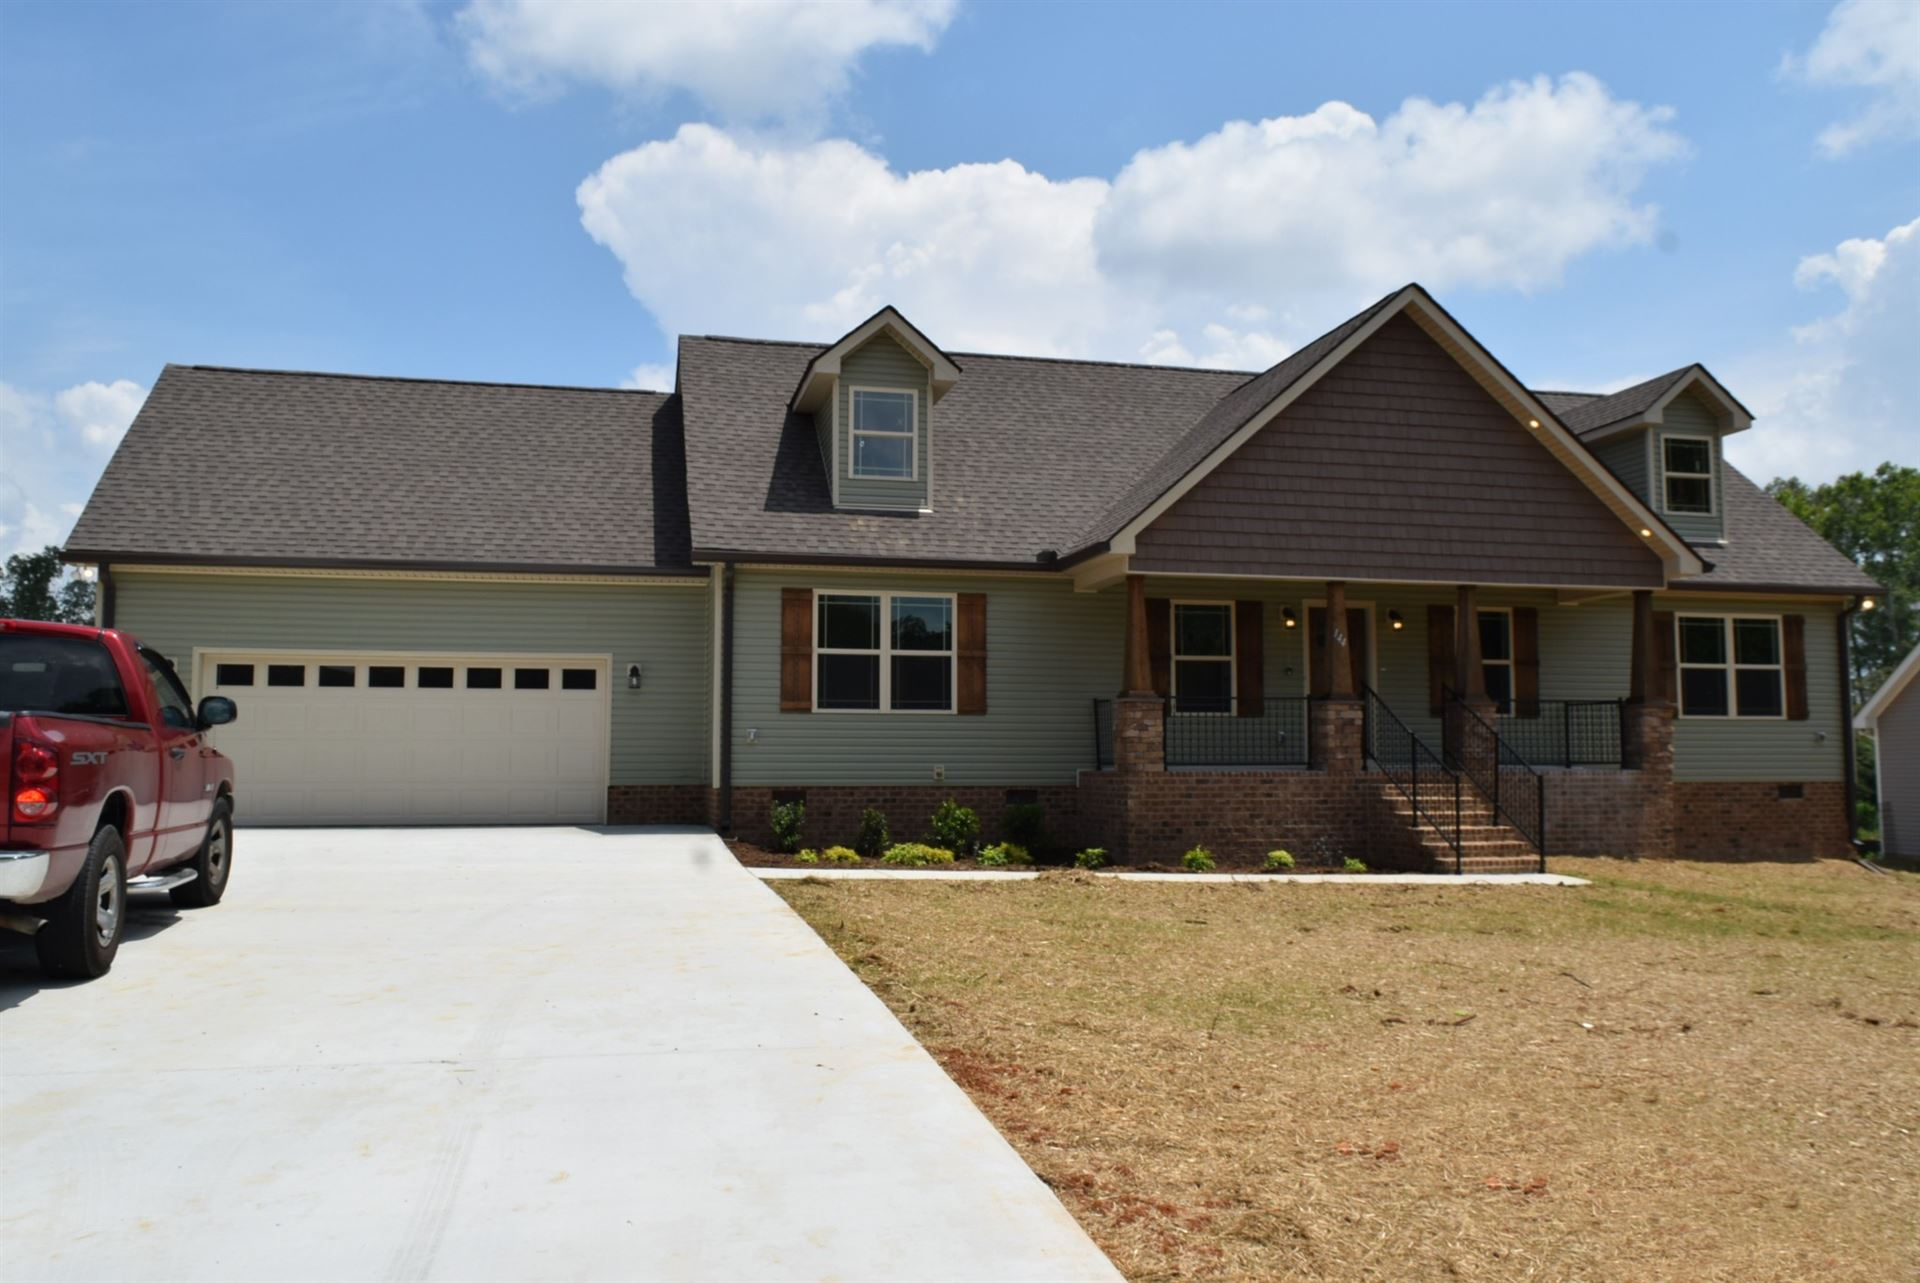 144 Riley Creek Road, Tullahoma, TN 37388 - MLS#: 2213738